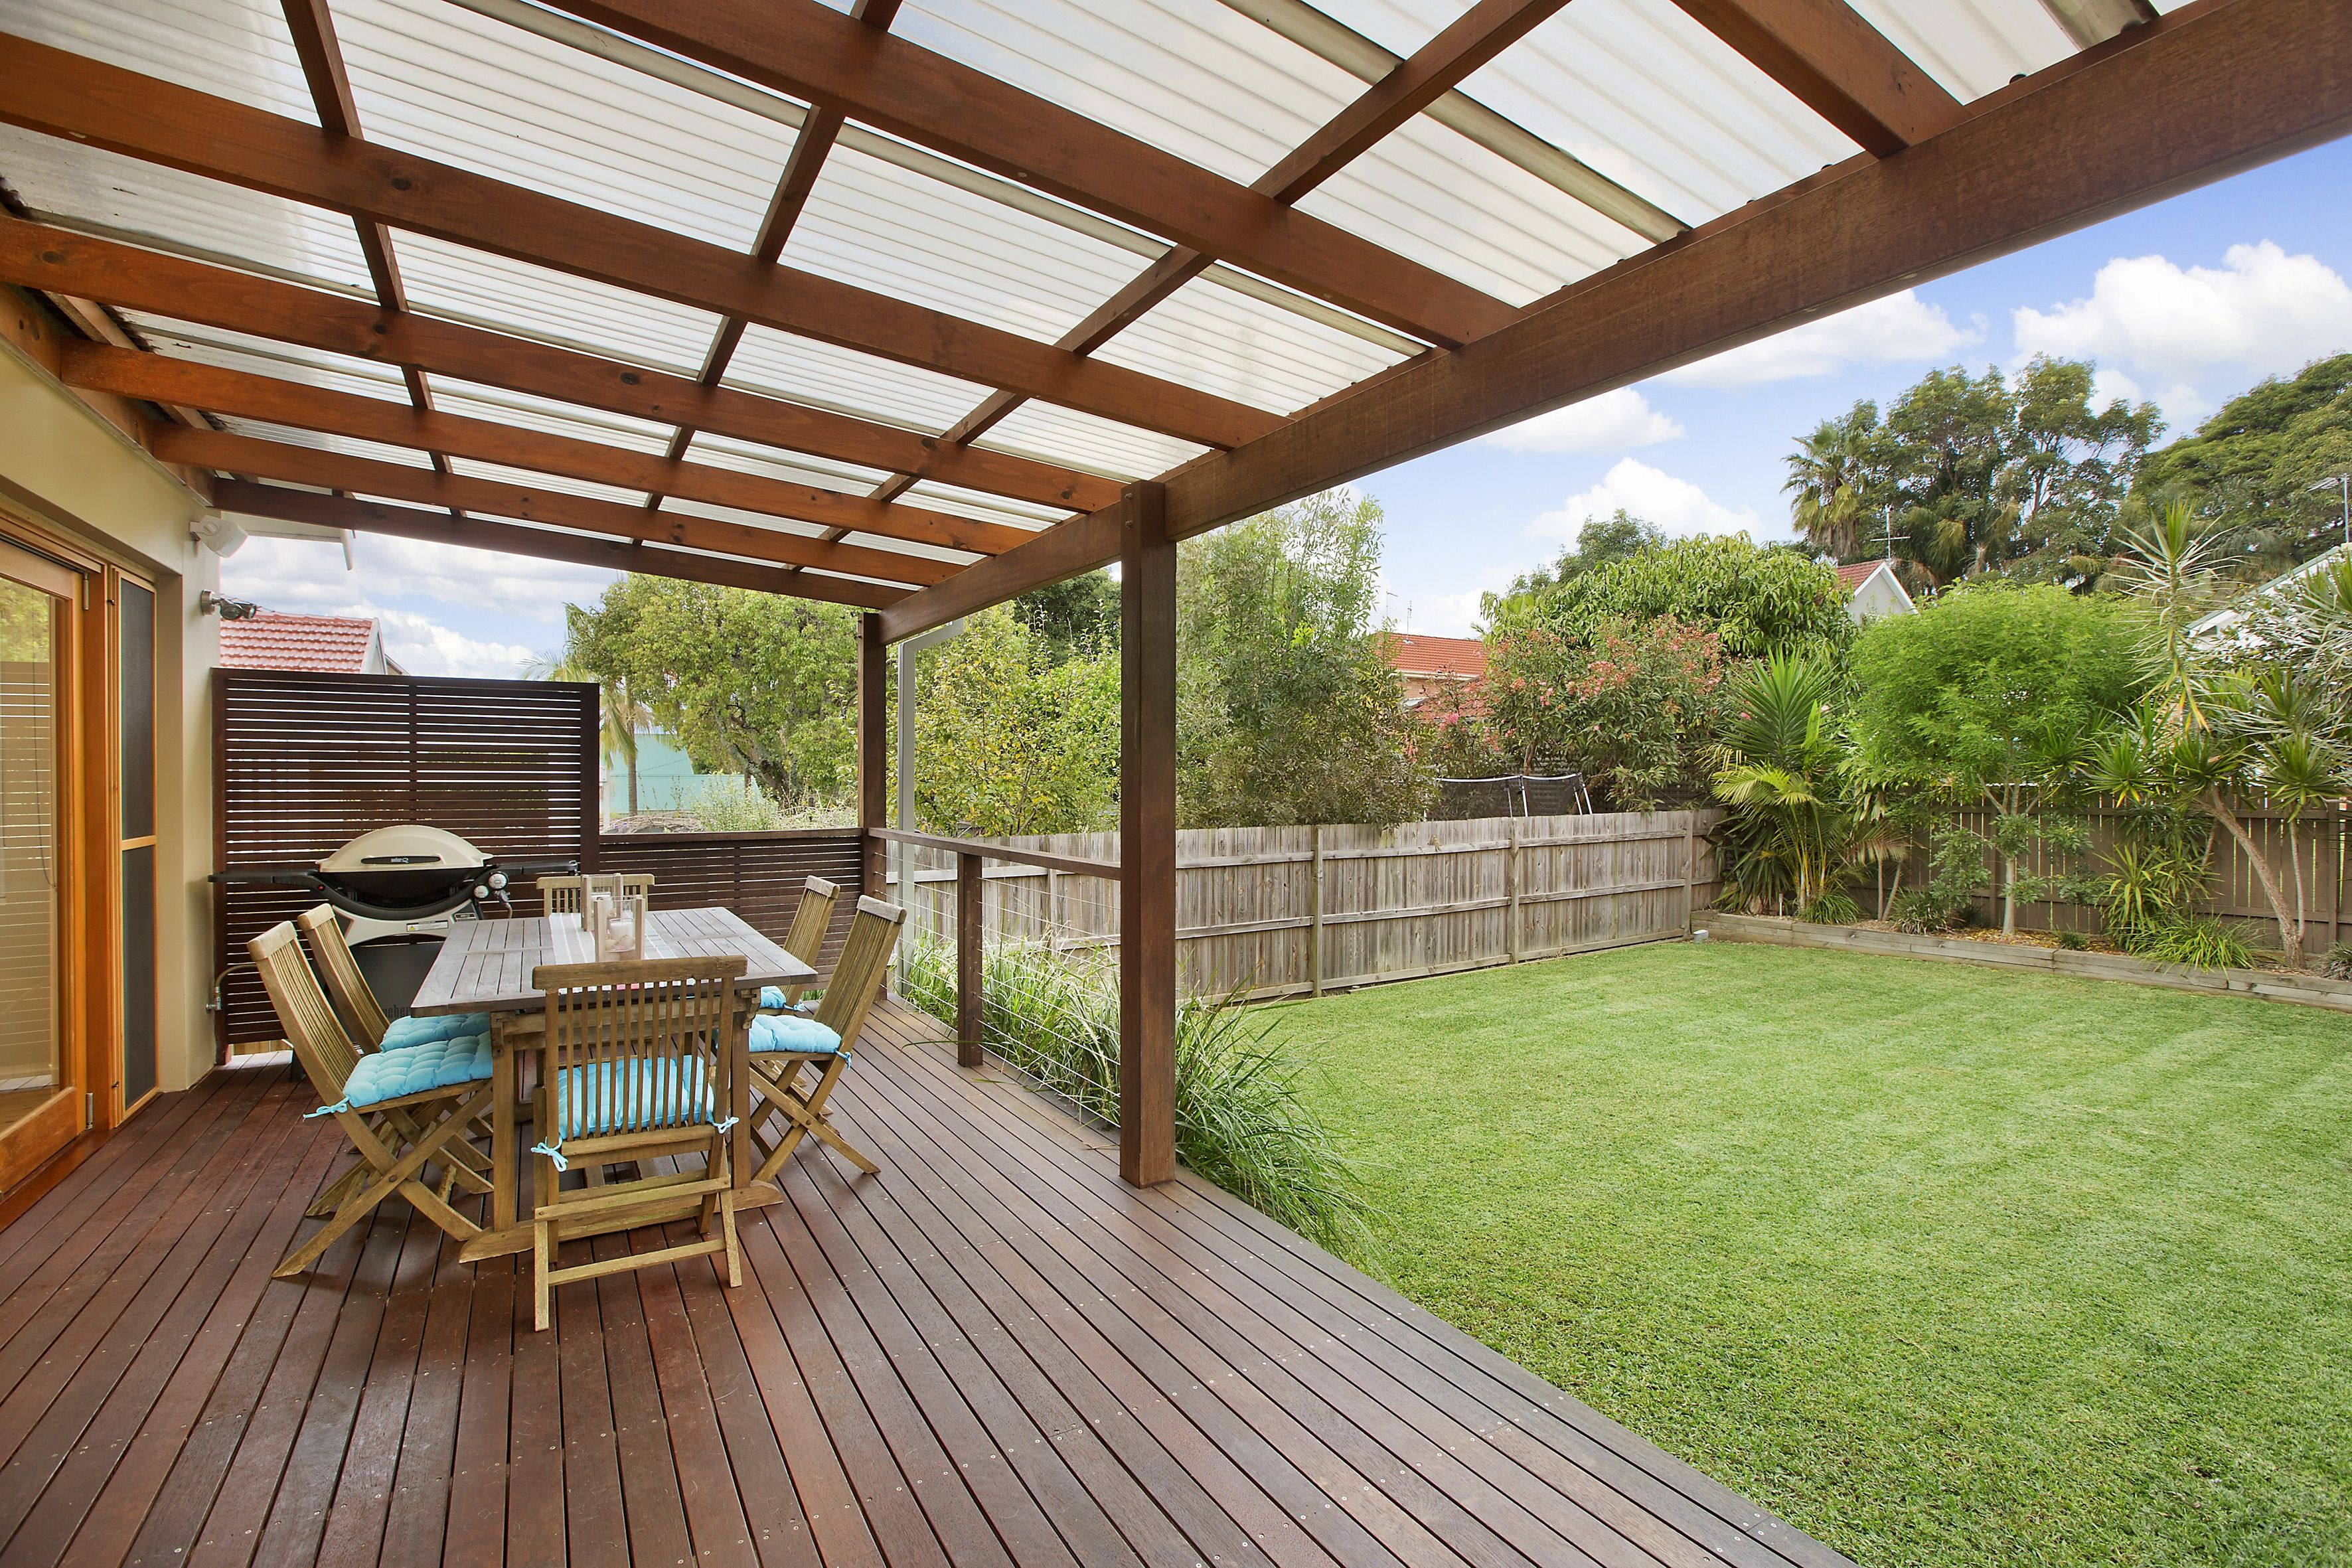 Decking With Roof Patio Deck Designs Patio Design Decks Backyard